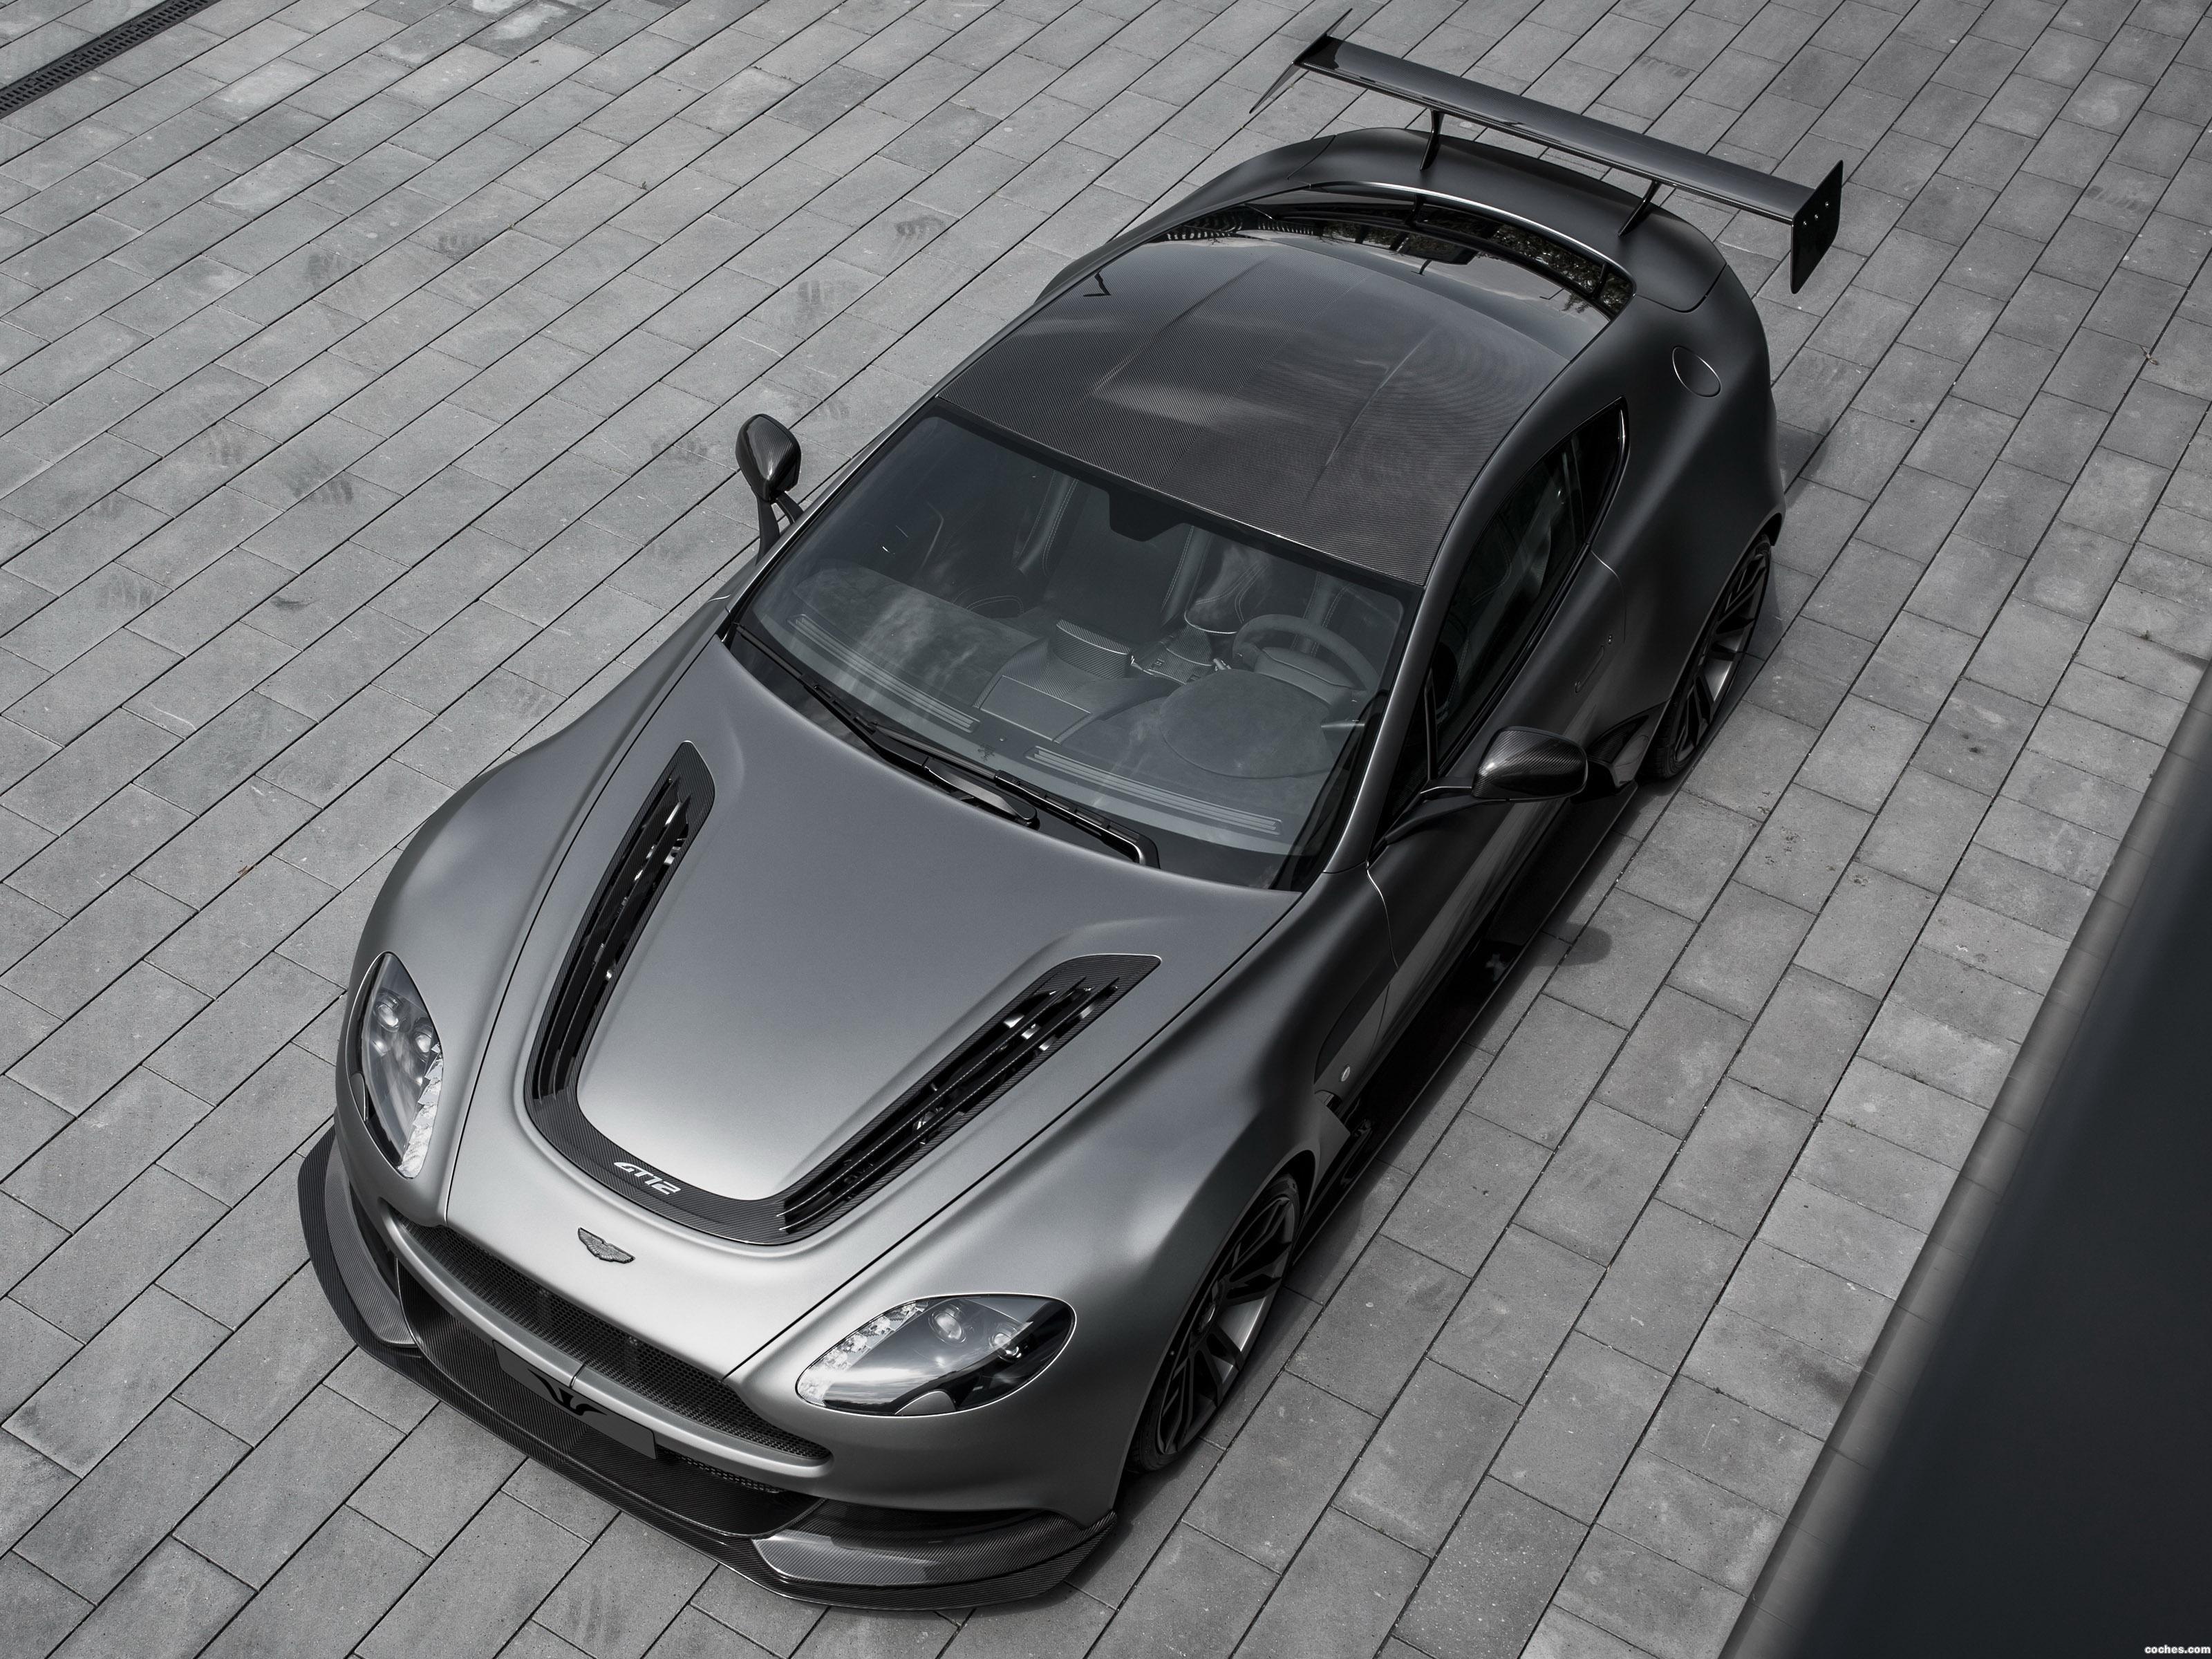 Foto 0 de Wheelsandmore Aston Martin V12 Vantage GT12 VIP Edition 2016